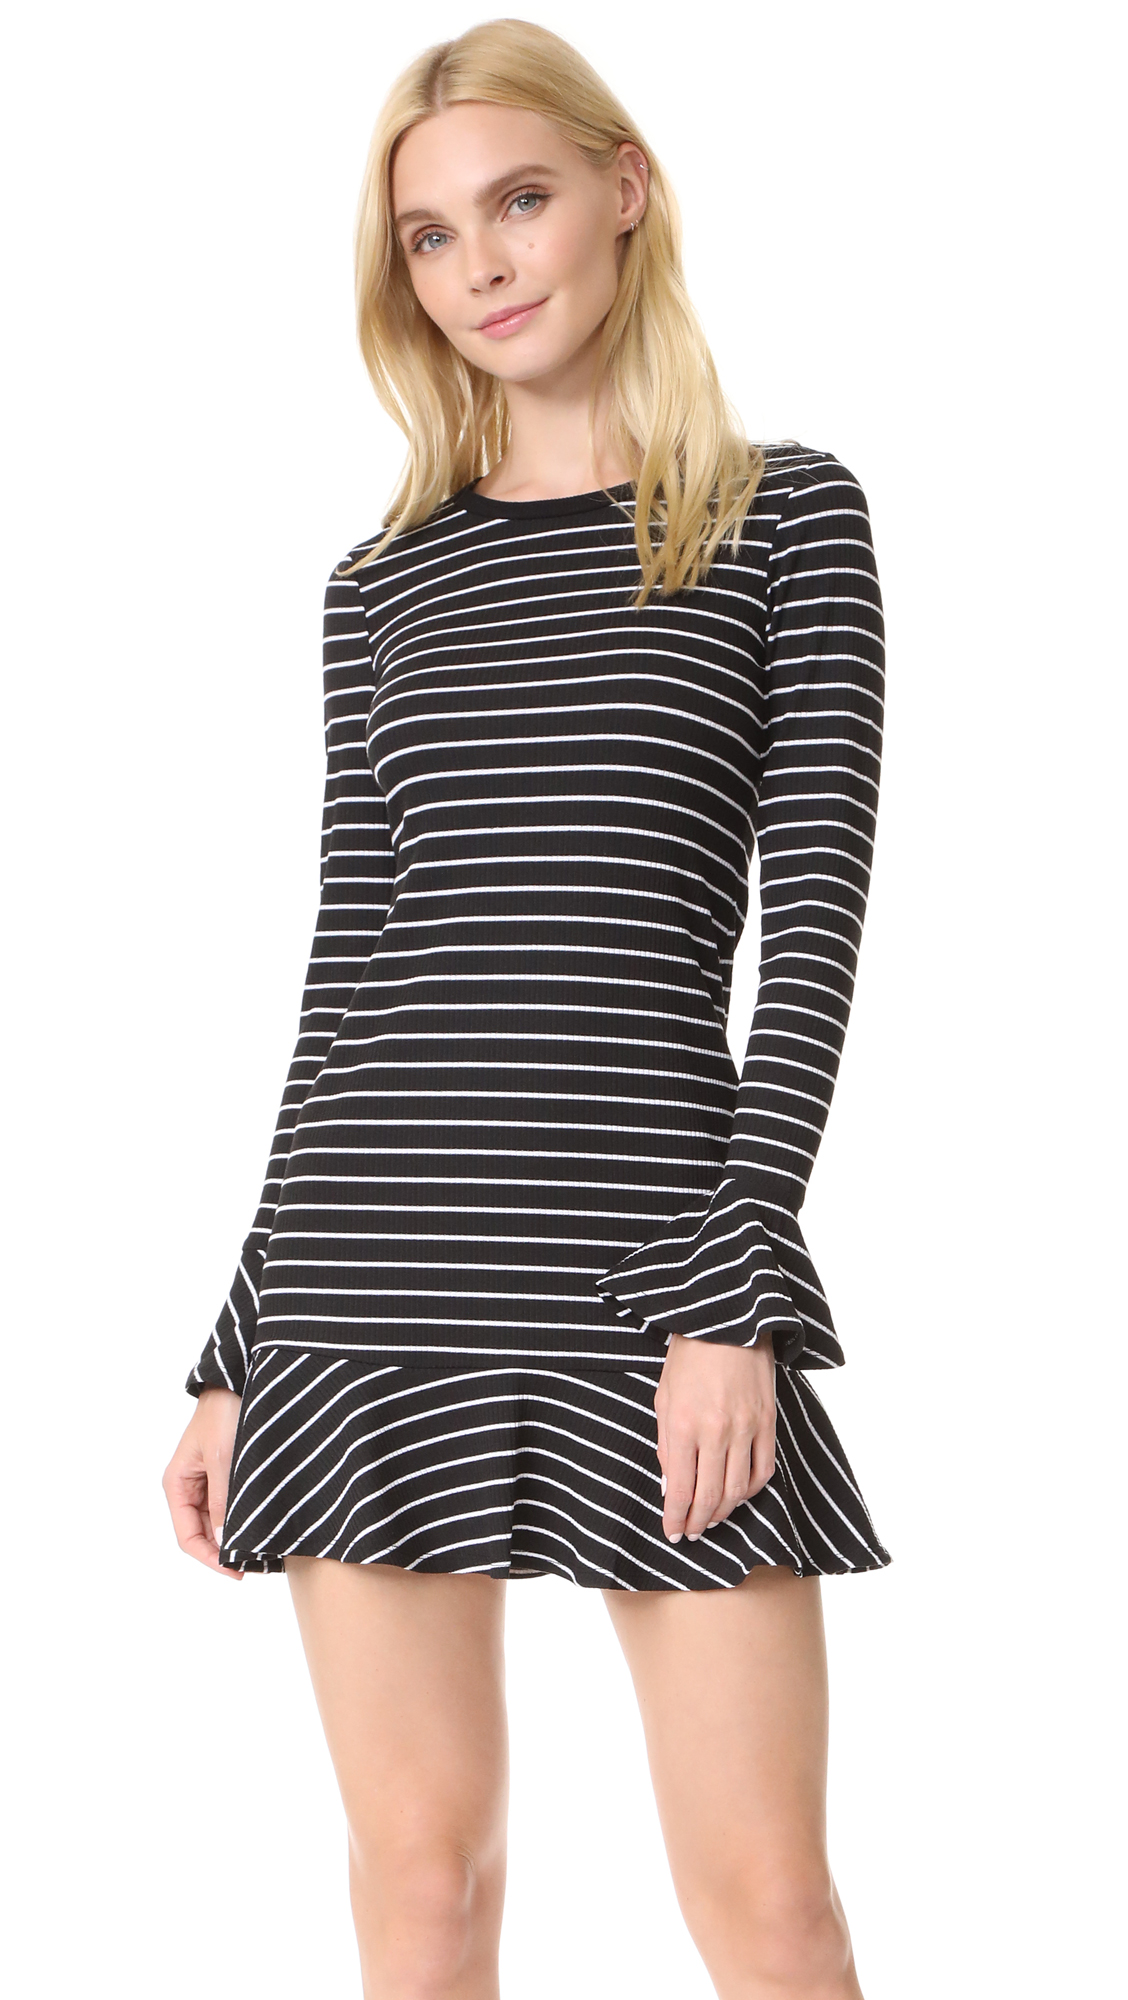 Saylor Tessa Stripe Dress